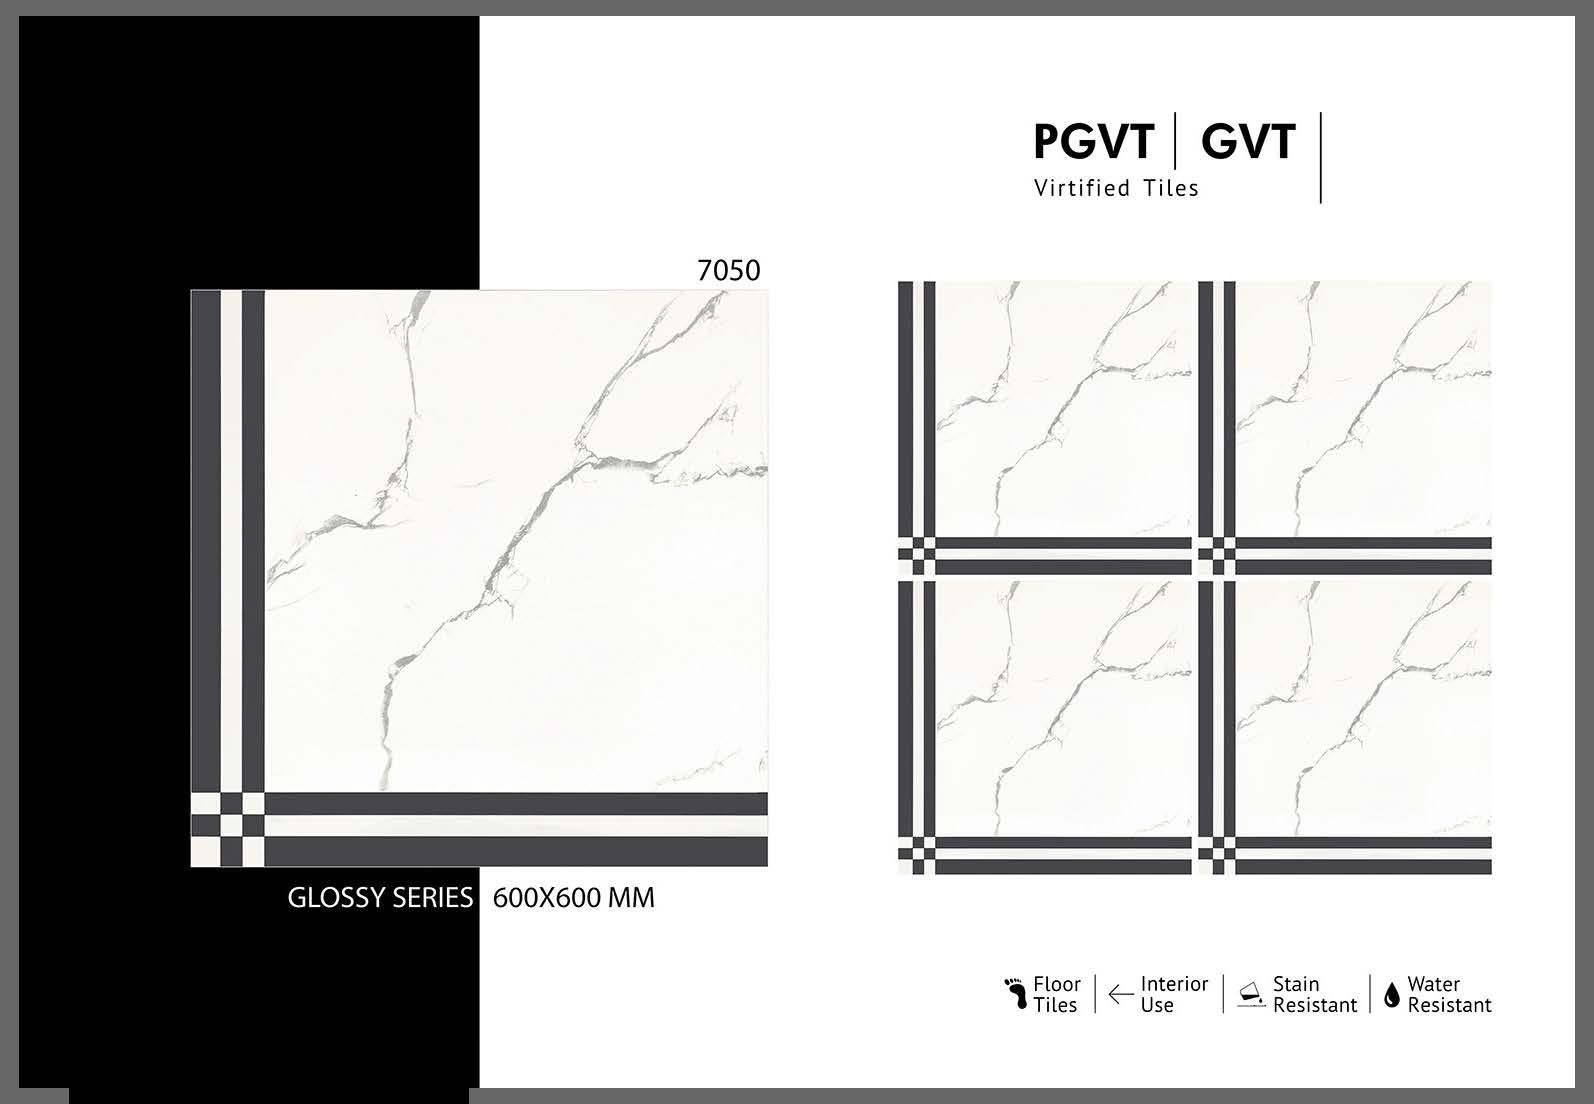 GVT 2X2 GLOSSY_Page_38.jpg